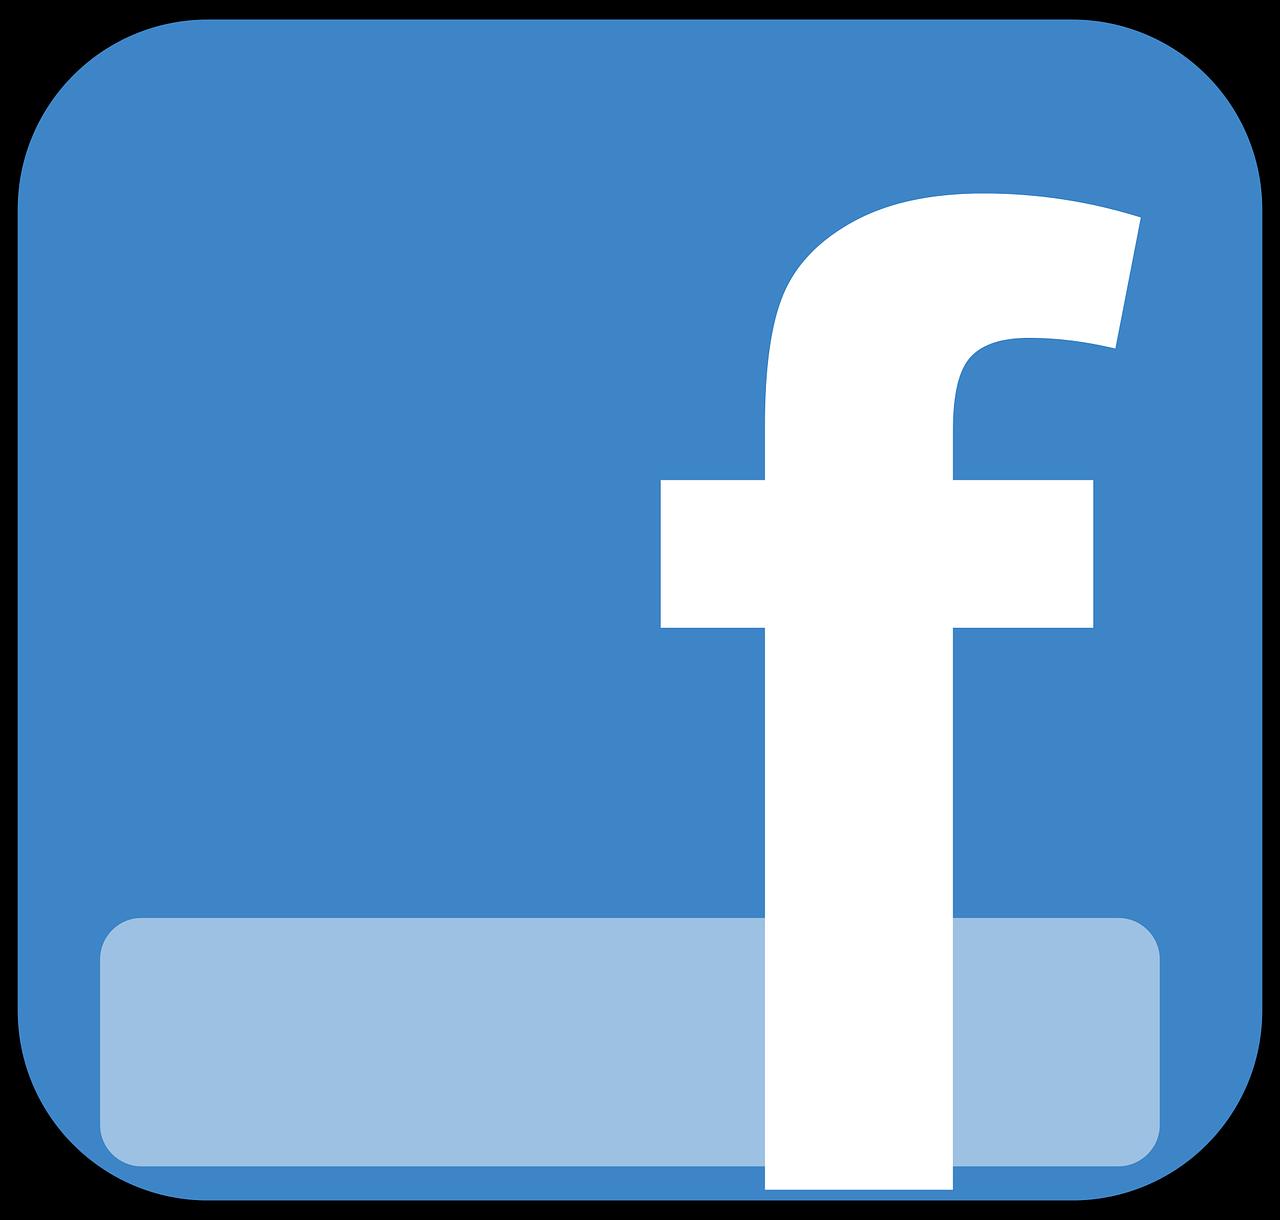 facebook-1924512_1280.png